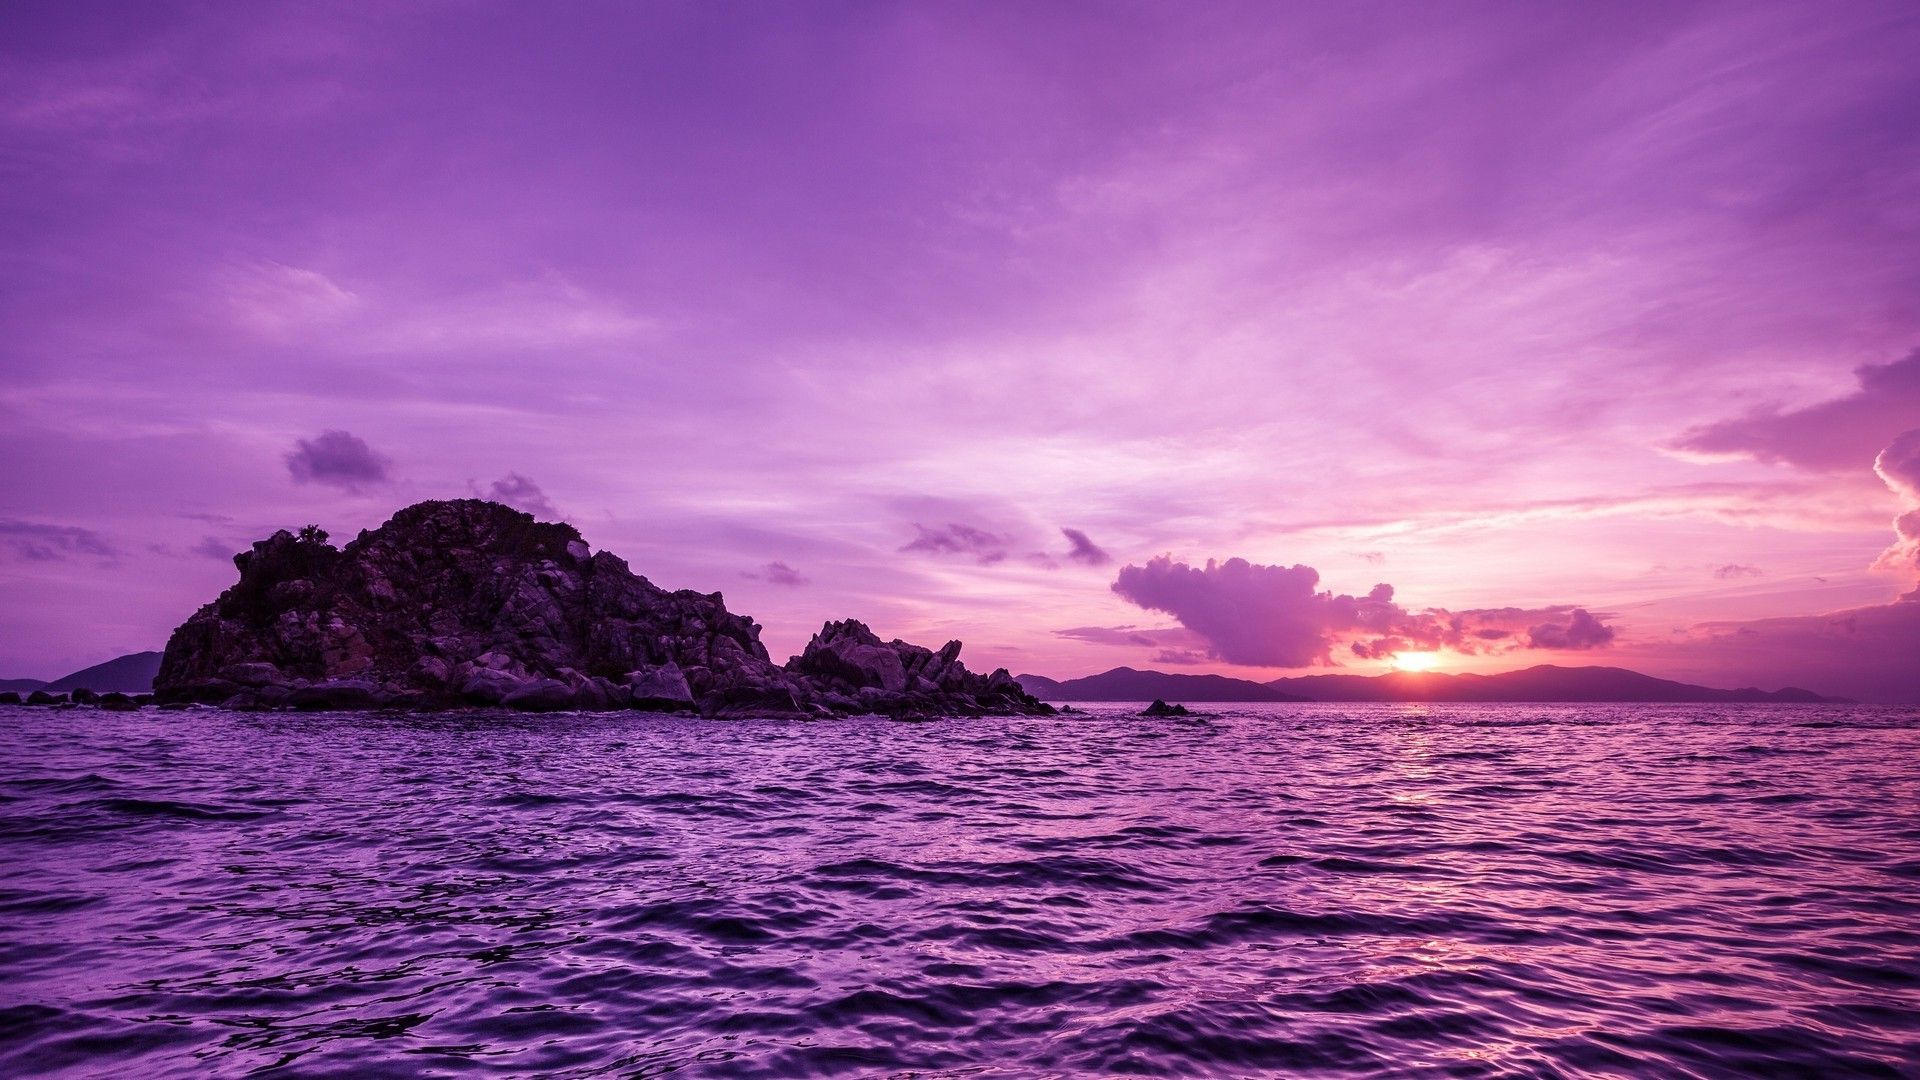 Monsta X Wallpaper Iphone Hd Purple Sea Hd Desktop Wallpaper Fullscreen Mobile Dual